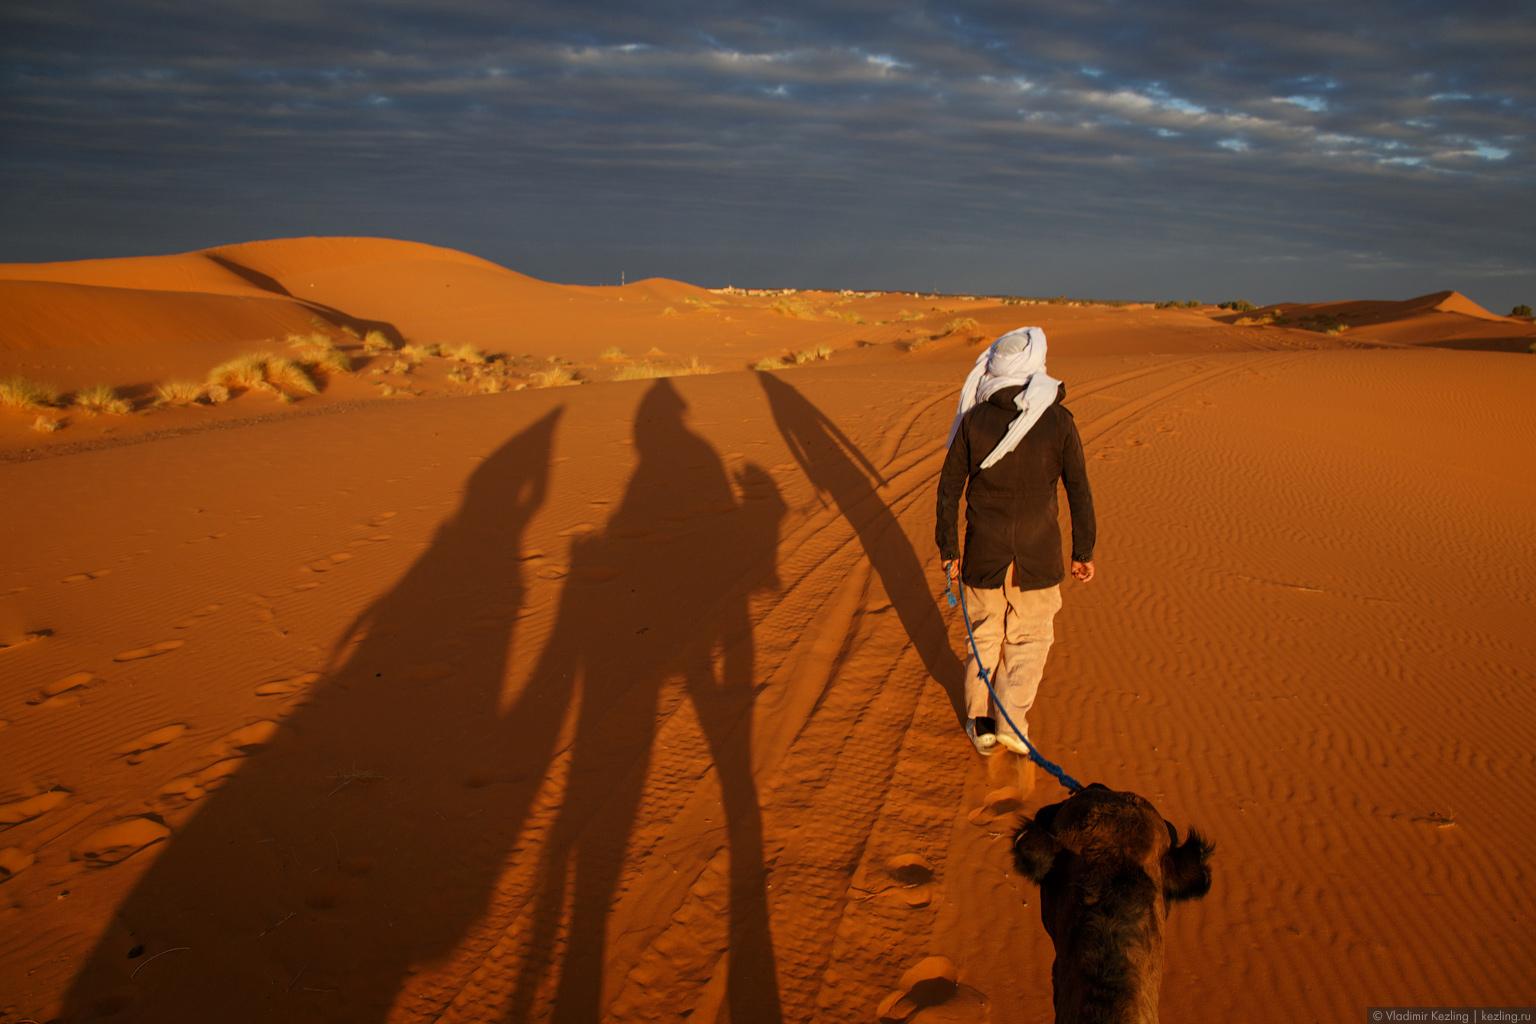 Марокканские сказки. Пустыня Сахара. Эрг Шебби